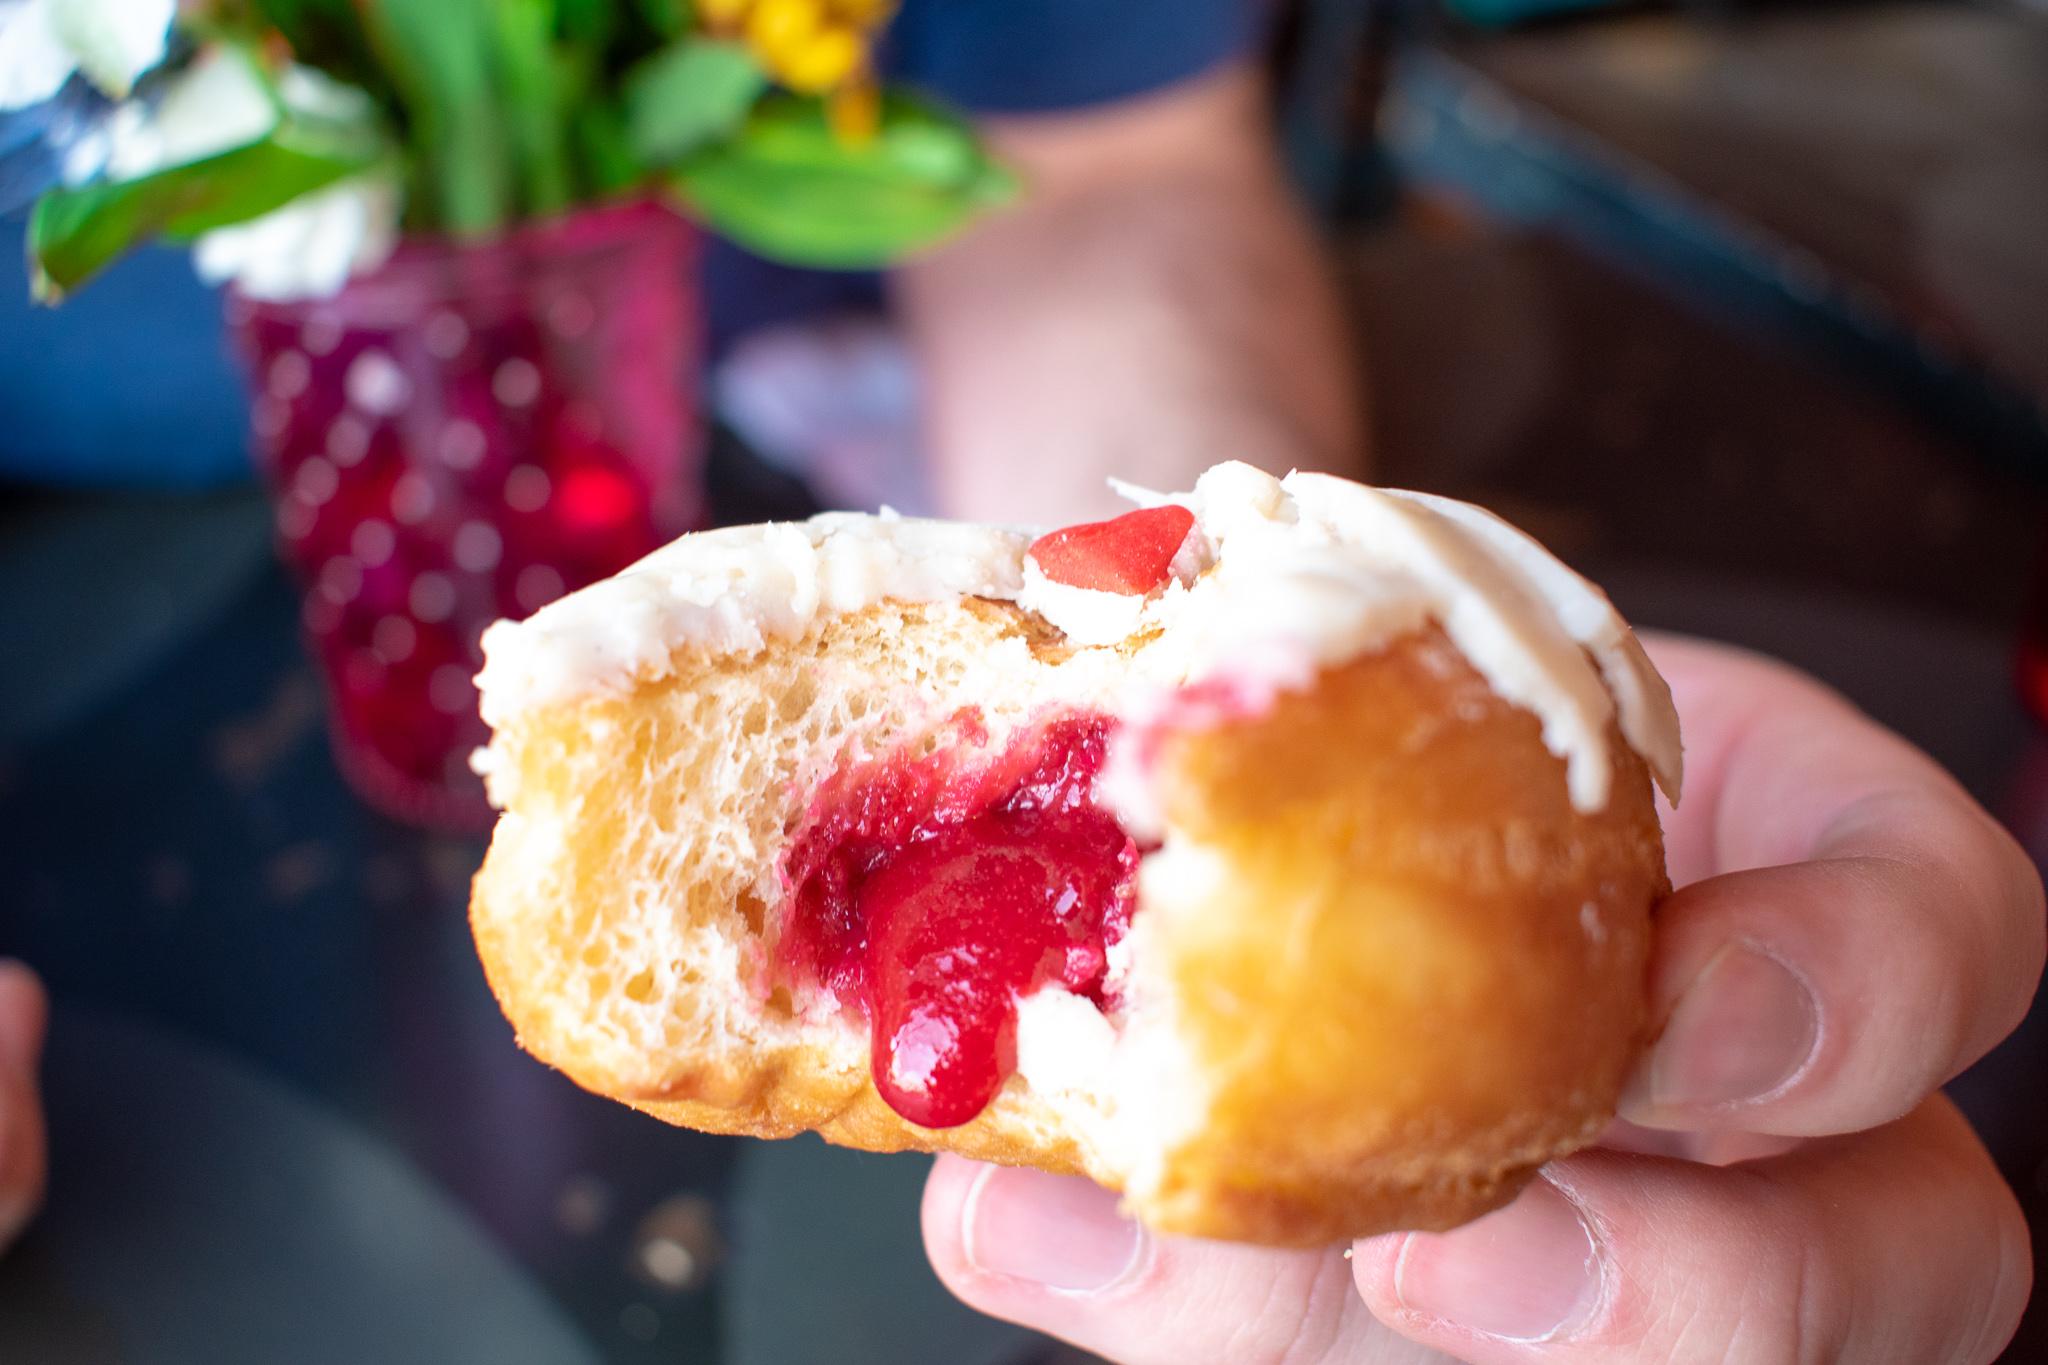 uprooted-traveler-glam-doll-doughnuts-vegan-minneapolis-st-paul-femme-fatale.jpg